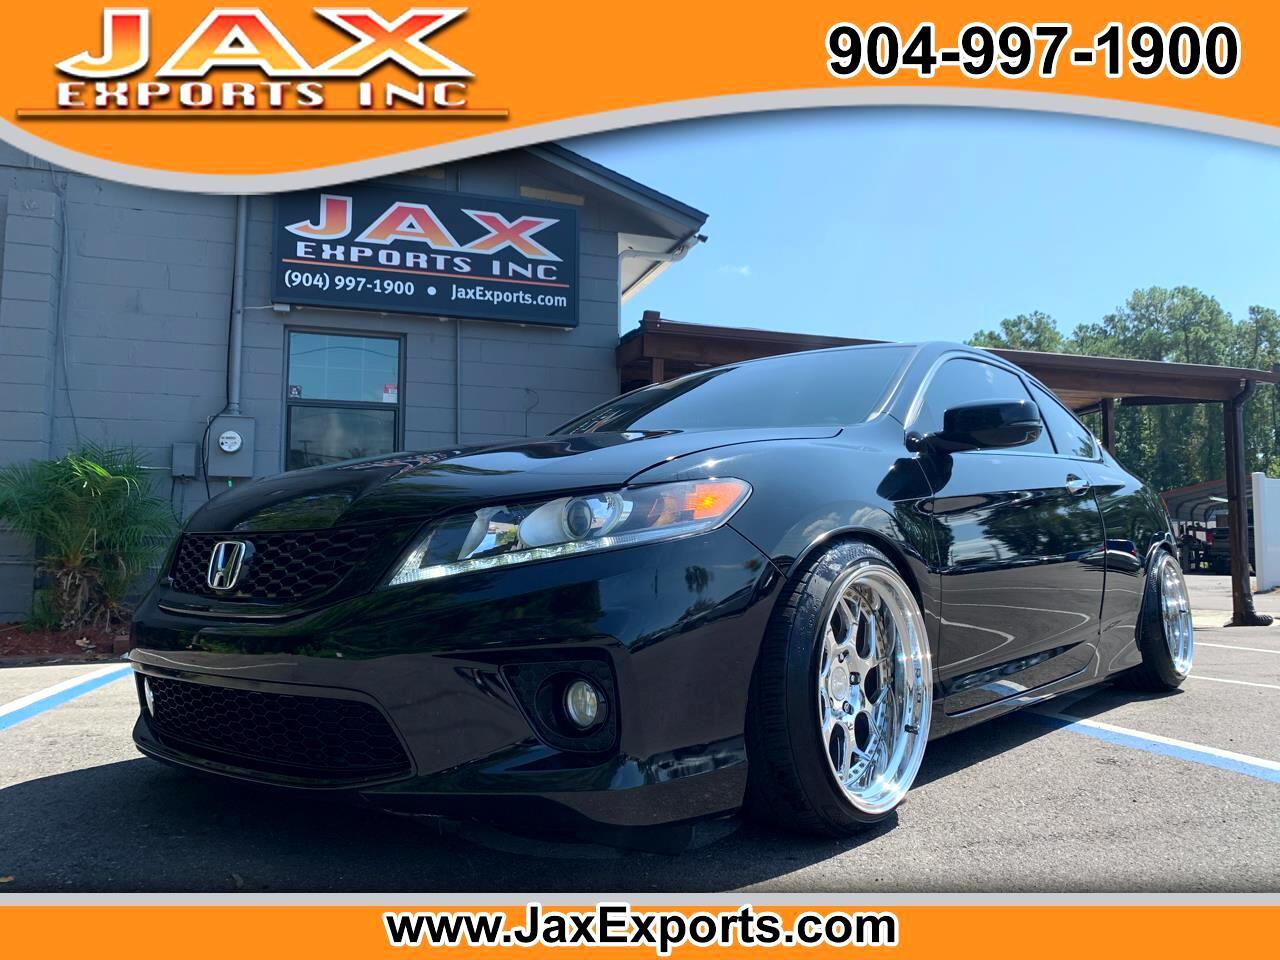 Honda Accord Cpe 2dr V6 Auto EX-L 2013